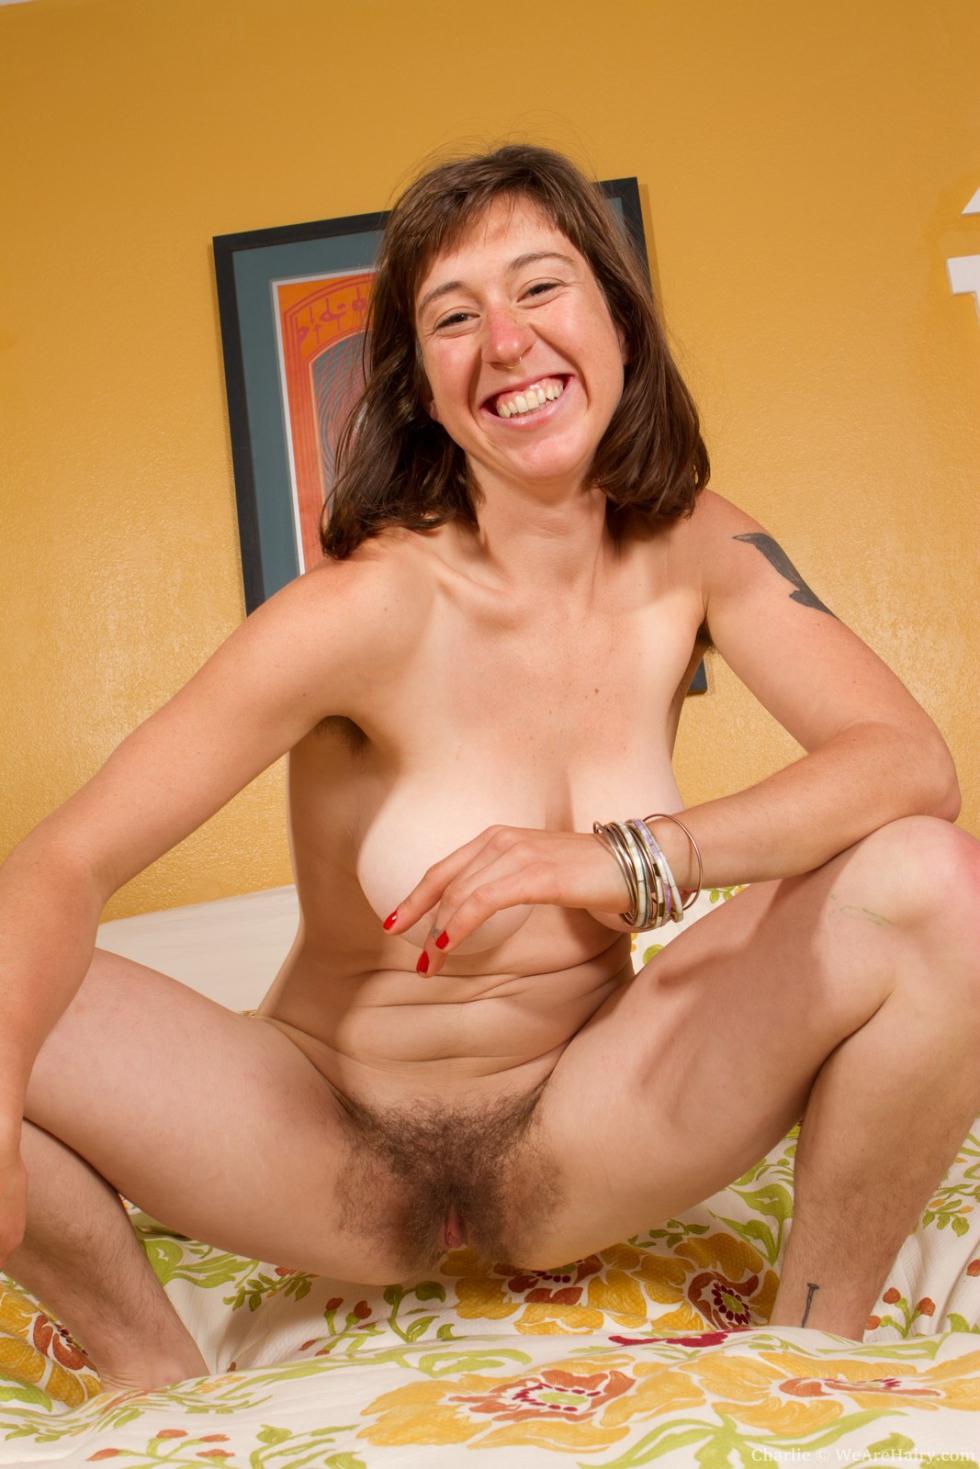 Evelina juliet hippie girl 2 - 1 part 9